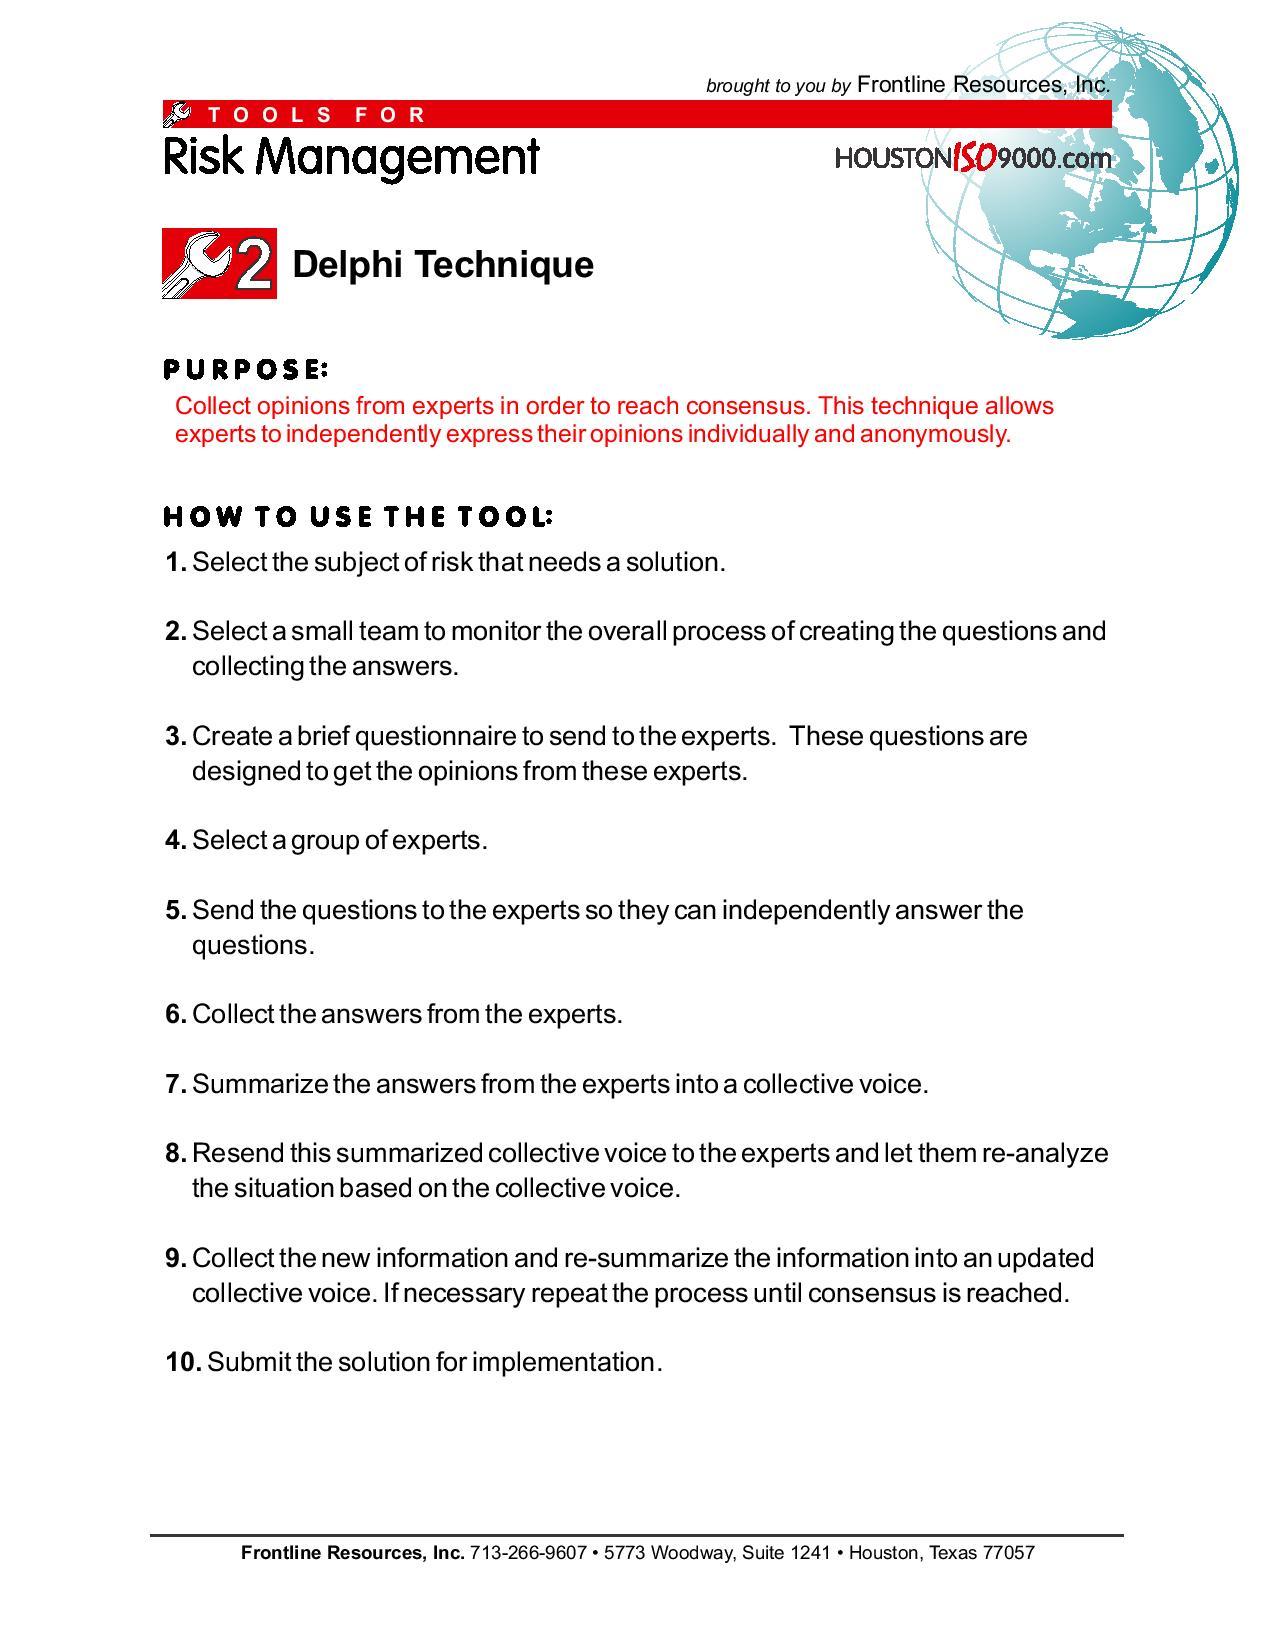 iso 13000 risk management pdf